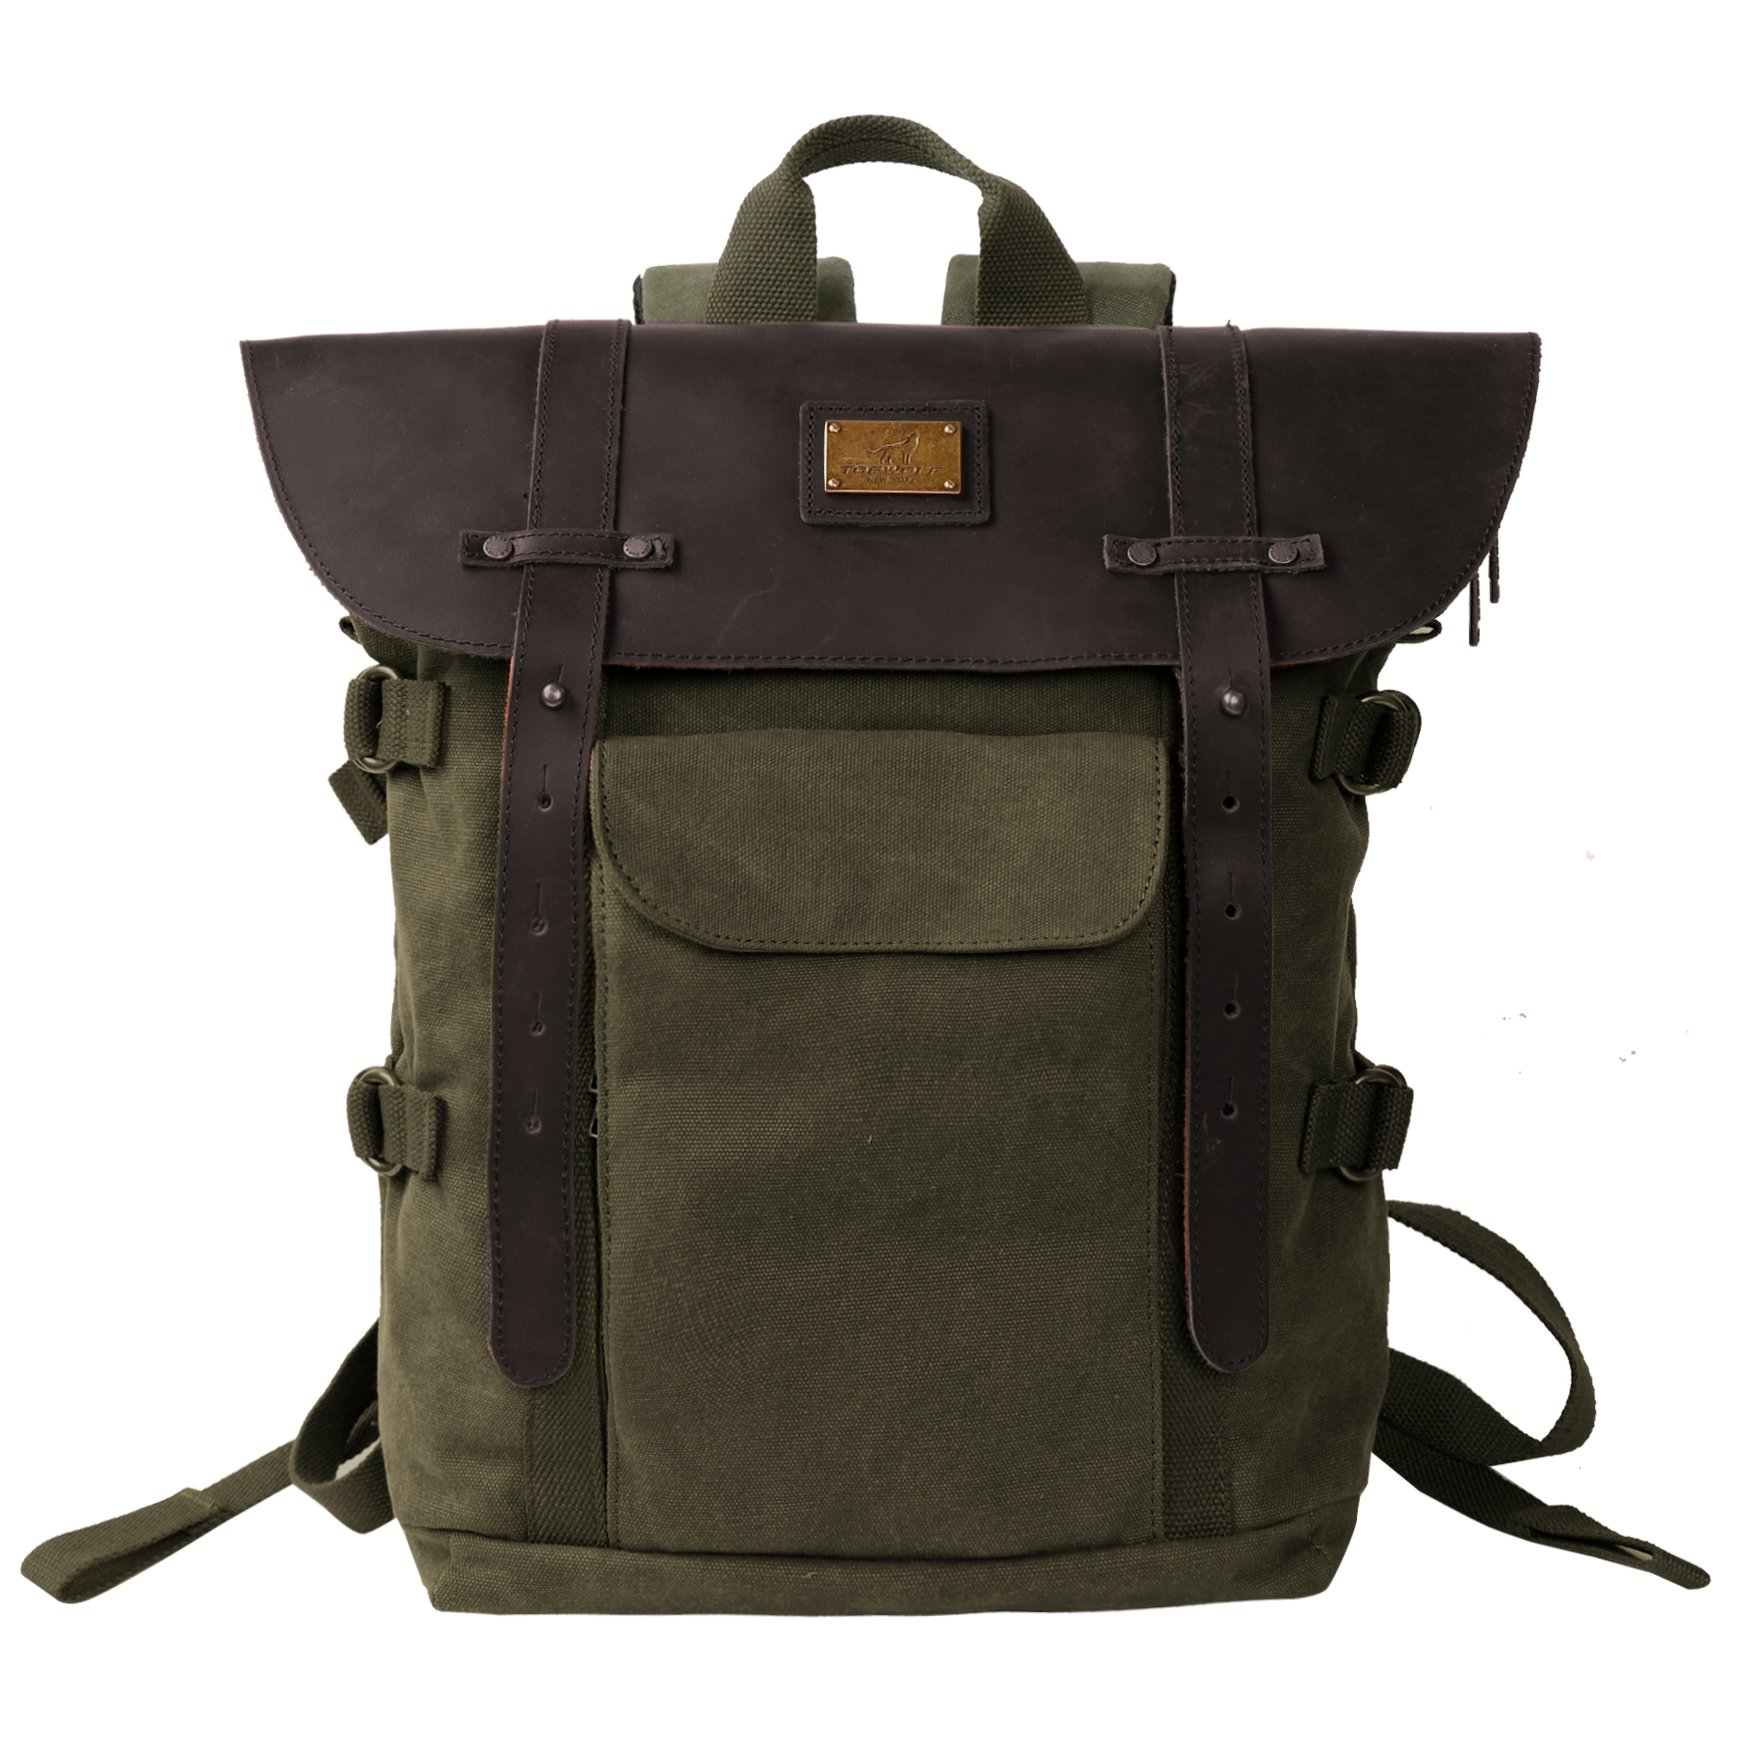 33f0531288 Leather Backpack for Men TOPWOLFS Canvas Backpack Vintage Rucksack fit  15.6″ Laptop Anti-theft Pocket Multifunction Books School Travel Bag